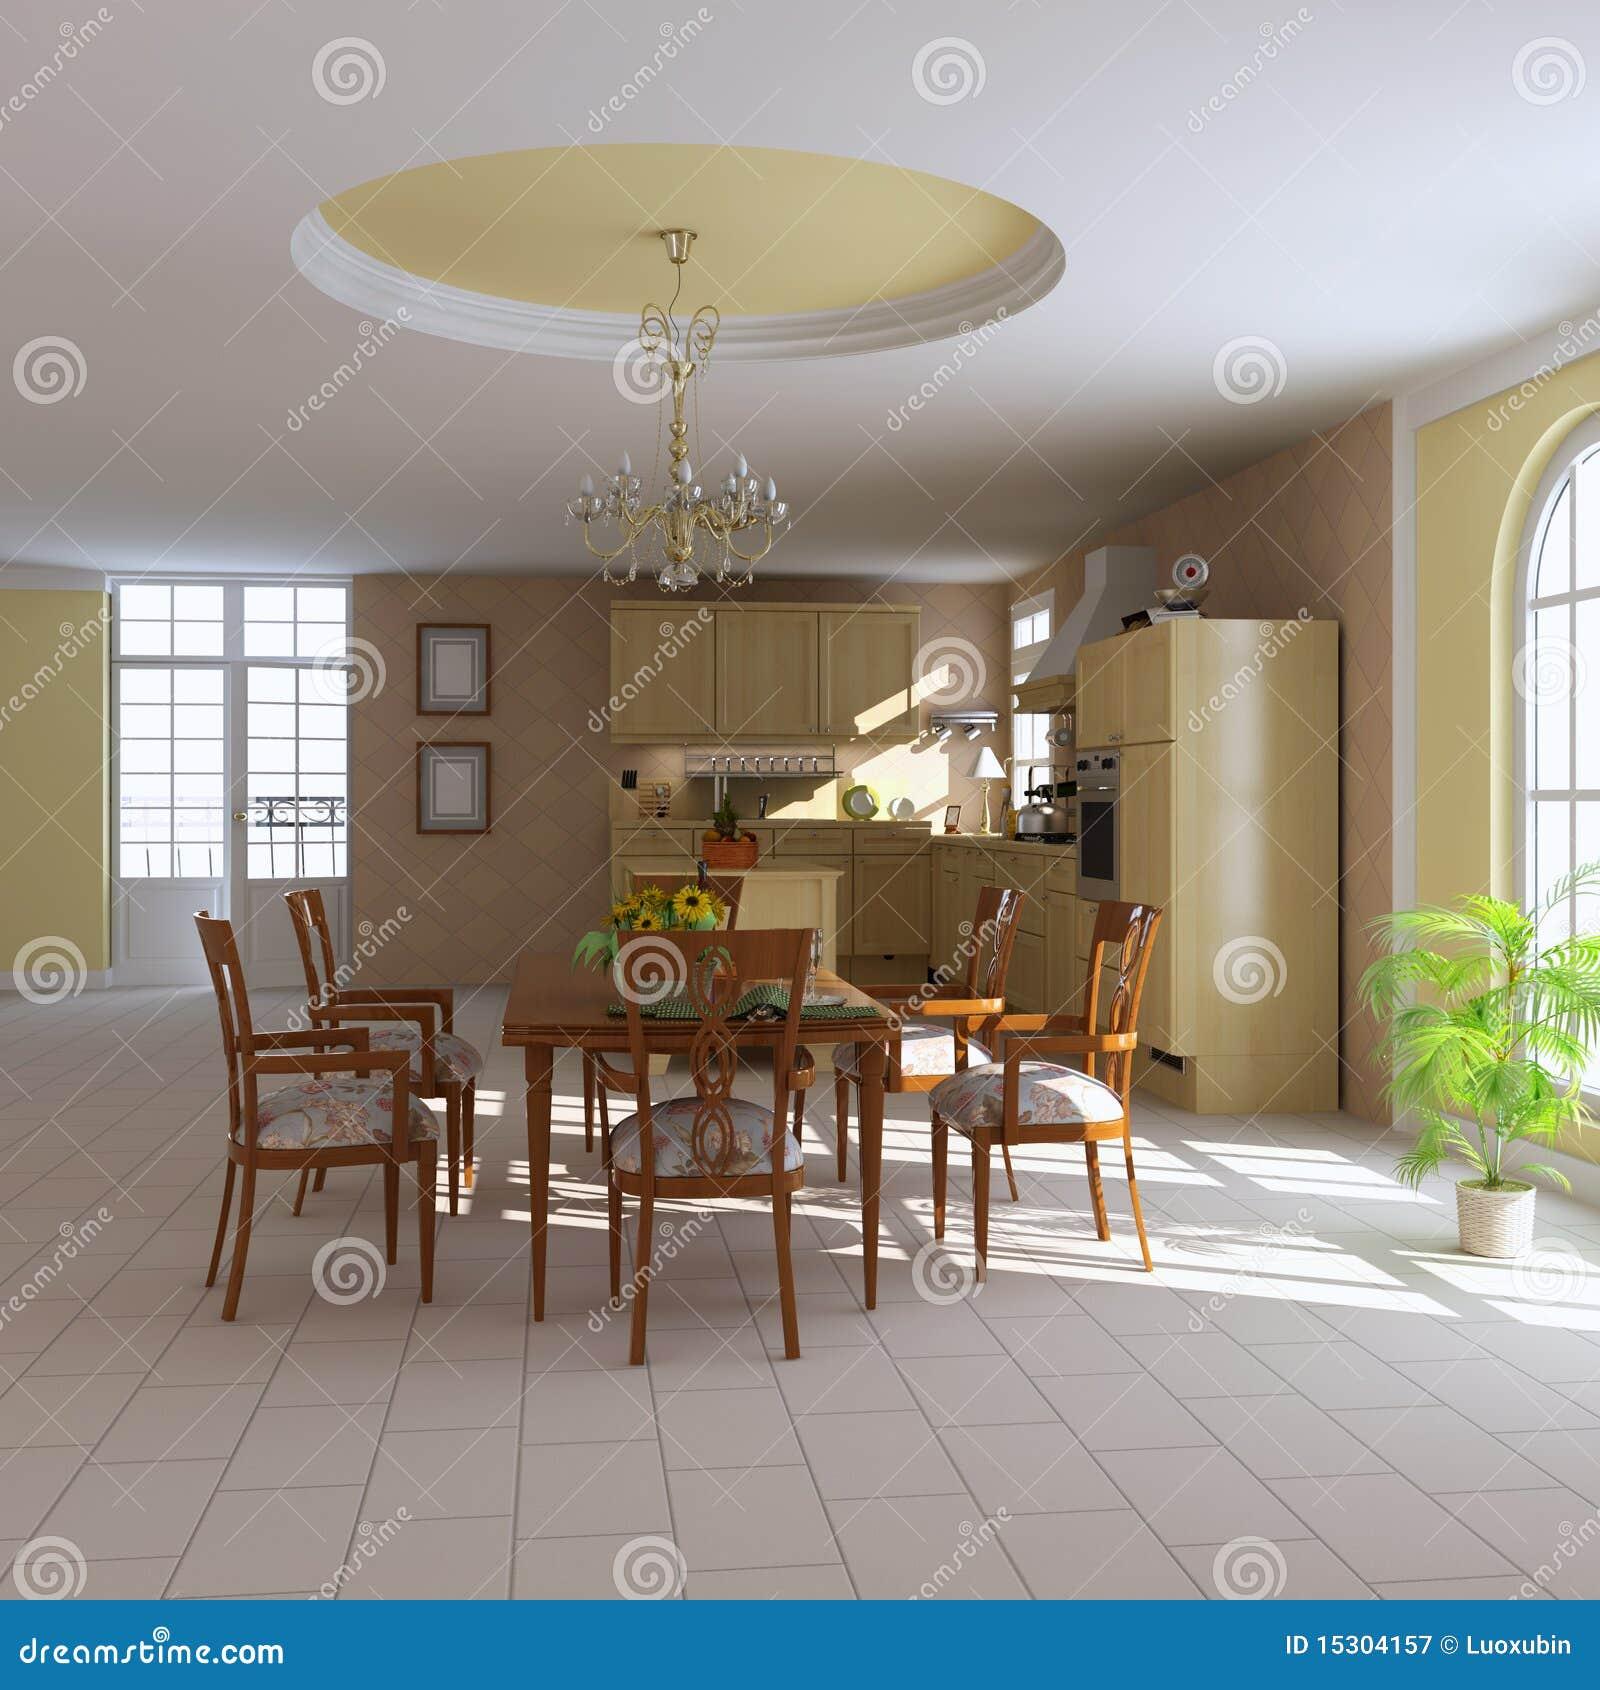 Klassieke eetkamer en keuken stock illustratie afbeelding 15304157 - Eetkamer keuken ...